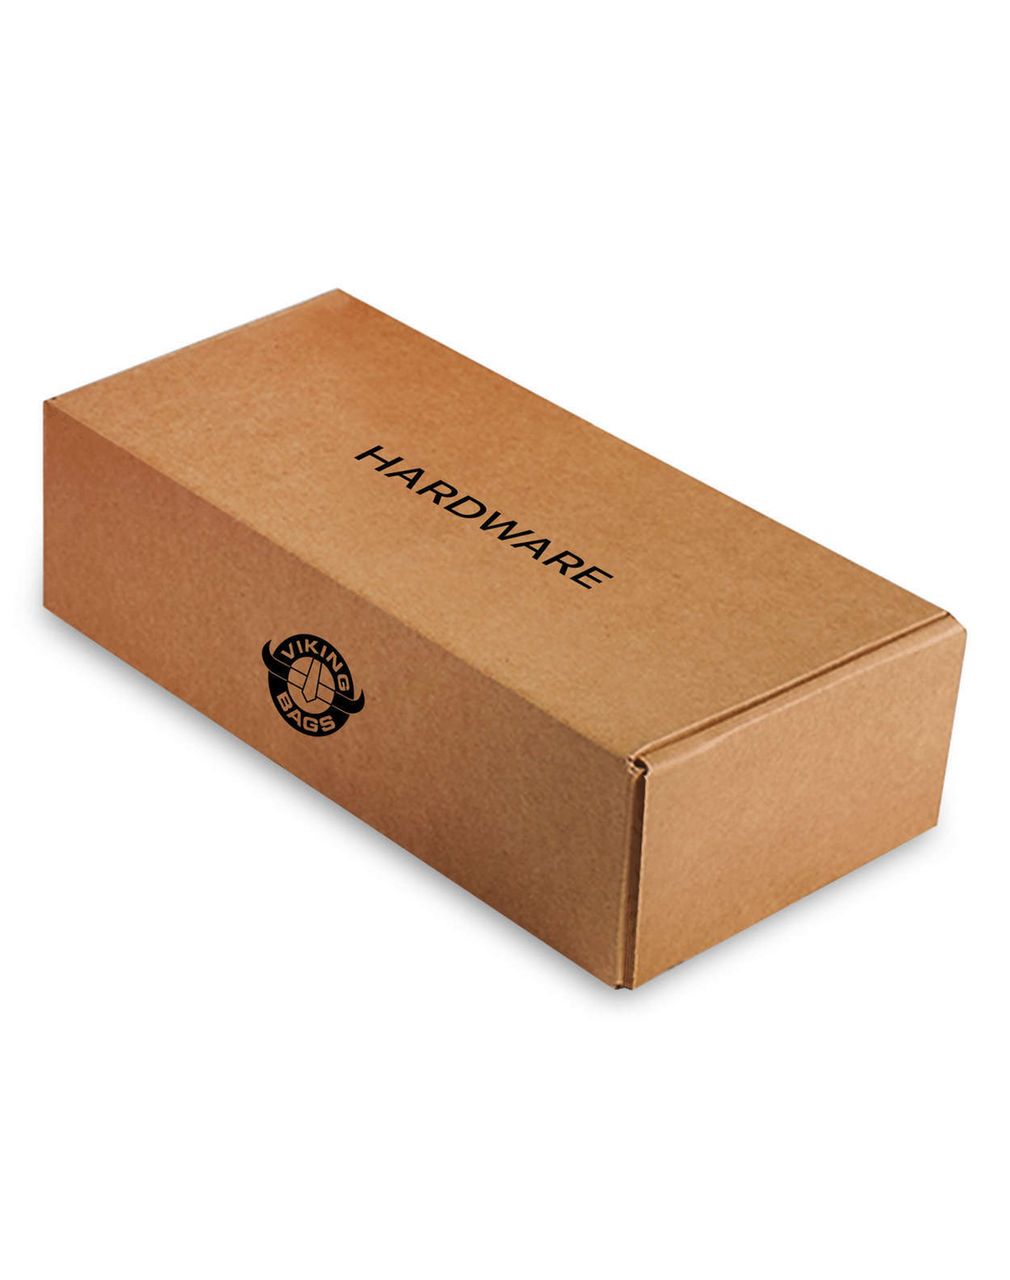 Suzuki Boulevard C90,VL1500, Intruder Trianon Saddle Bag Hardware Box